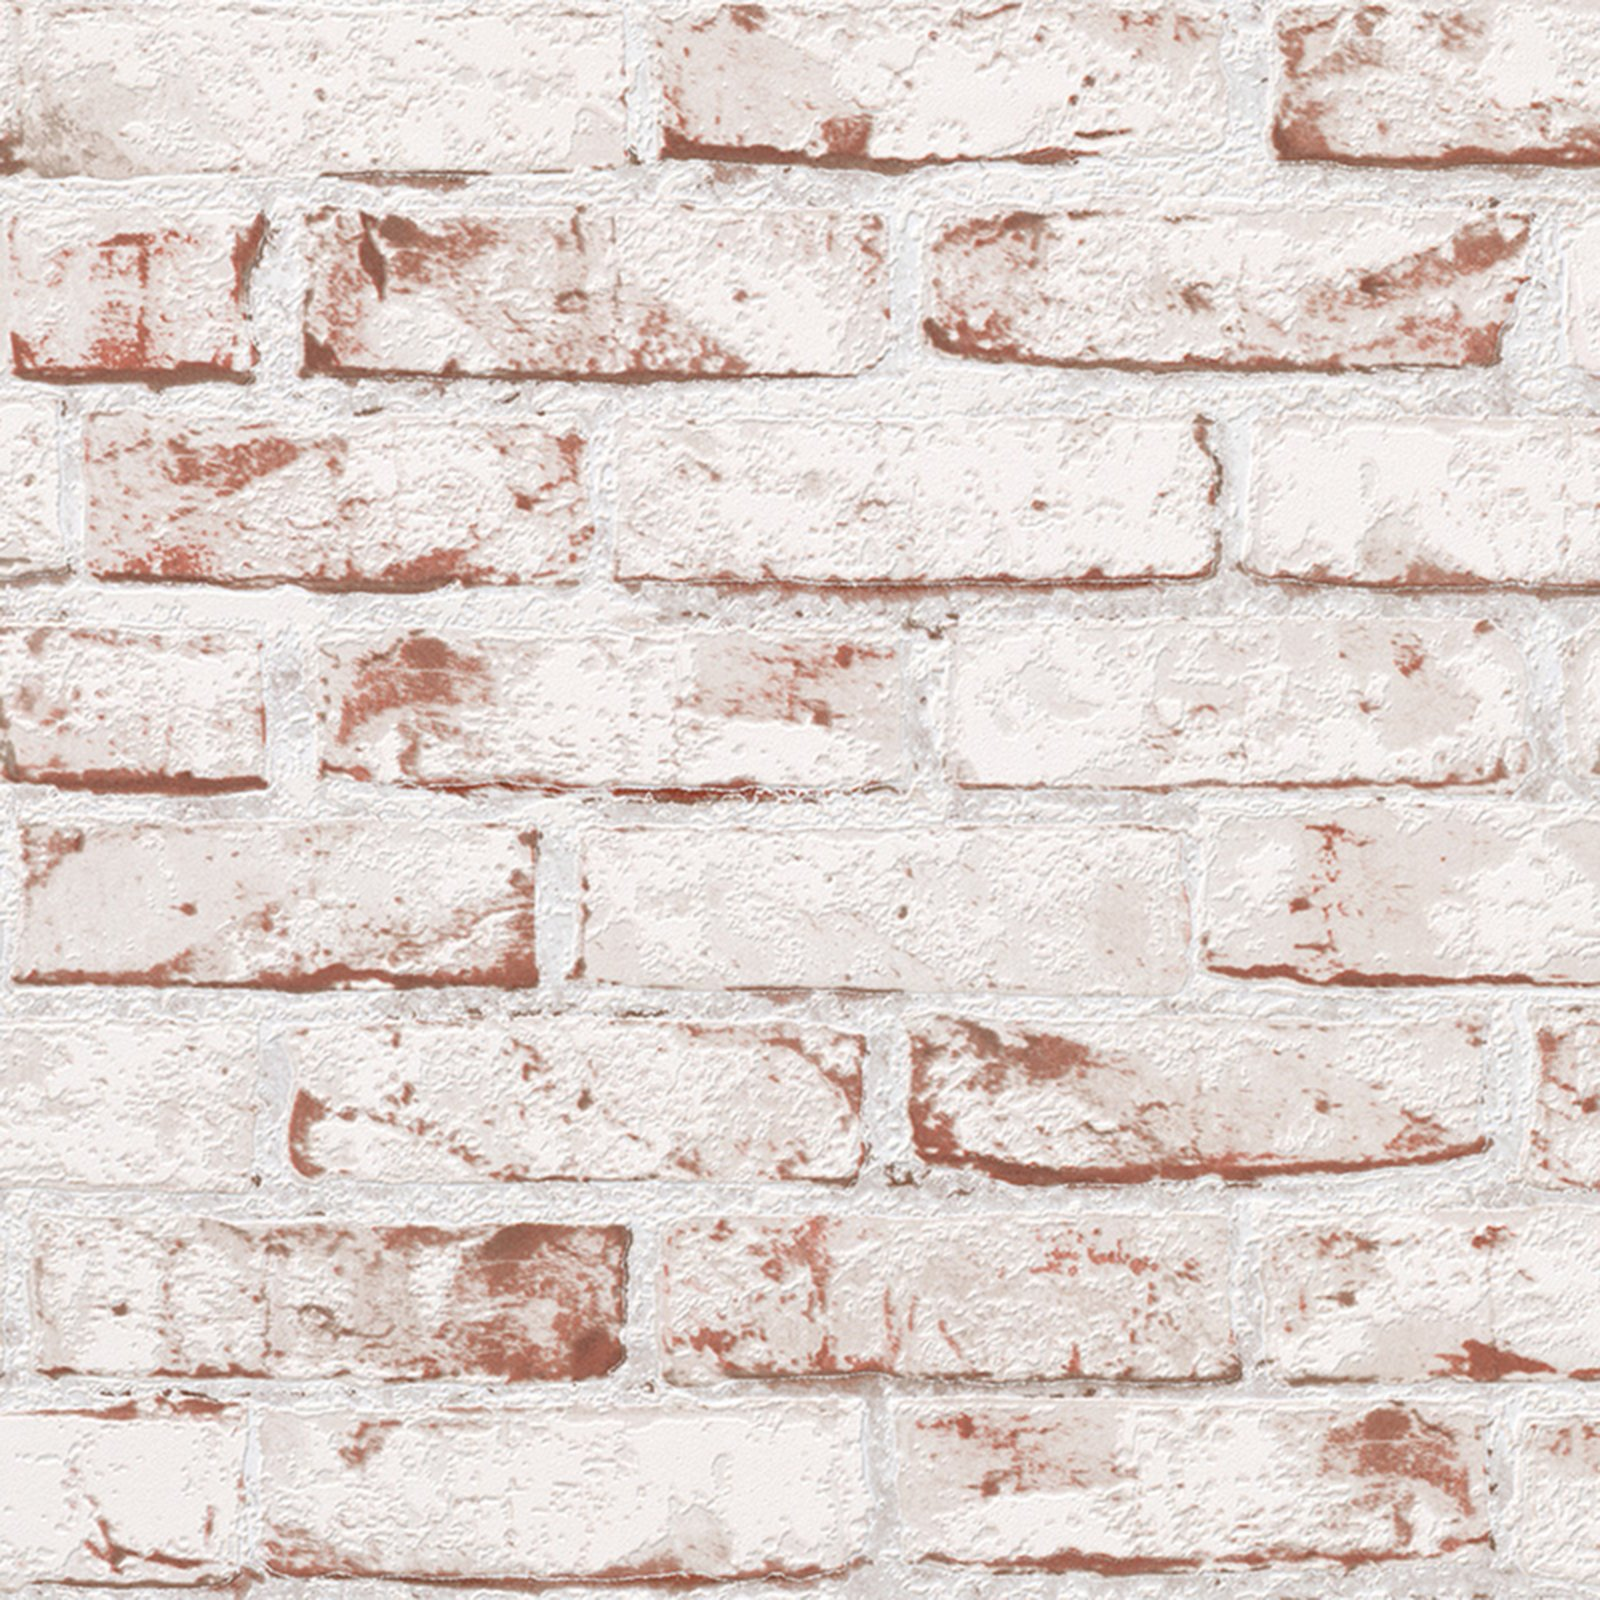 a s creation vliestapete steinoptik rot 10 meter vliestapeten tapeten borten. Black Bedroom Furniture Sets. Home Design Ideas